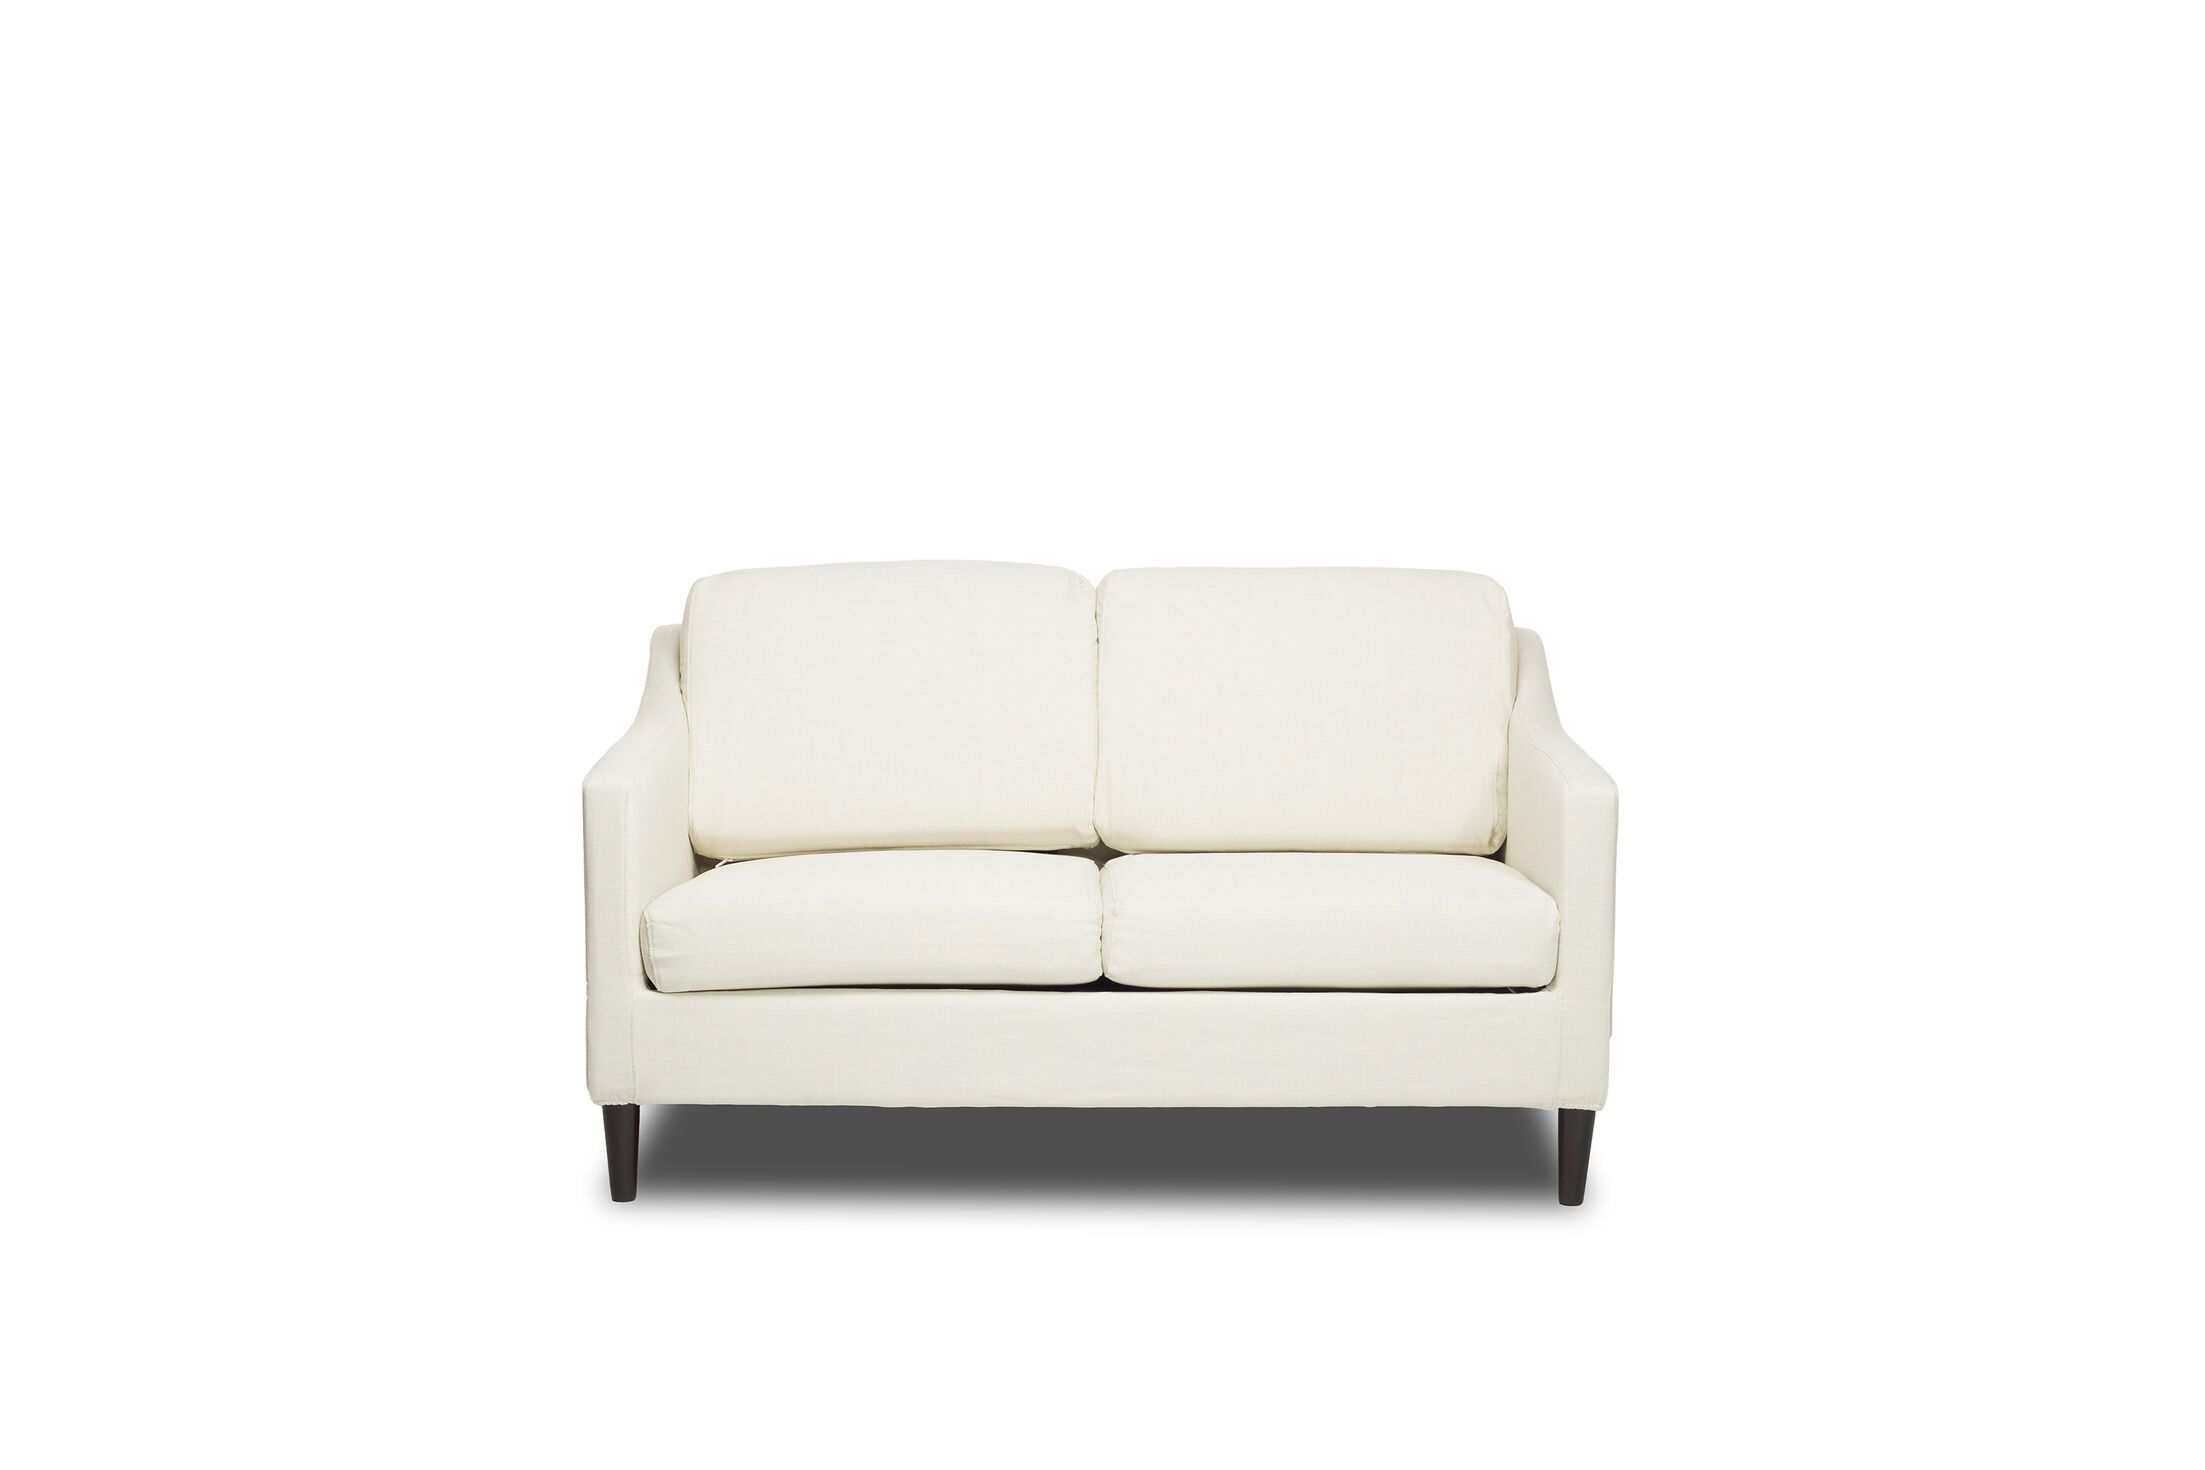 Cobbtown Standard Loveseat Upholstery: Glacier